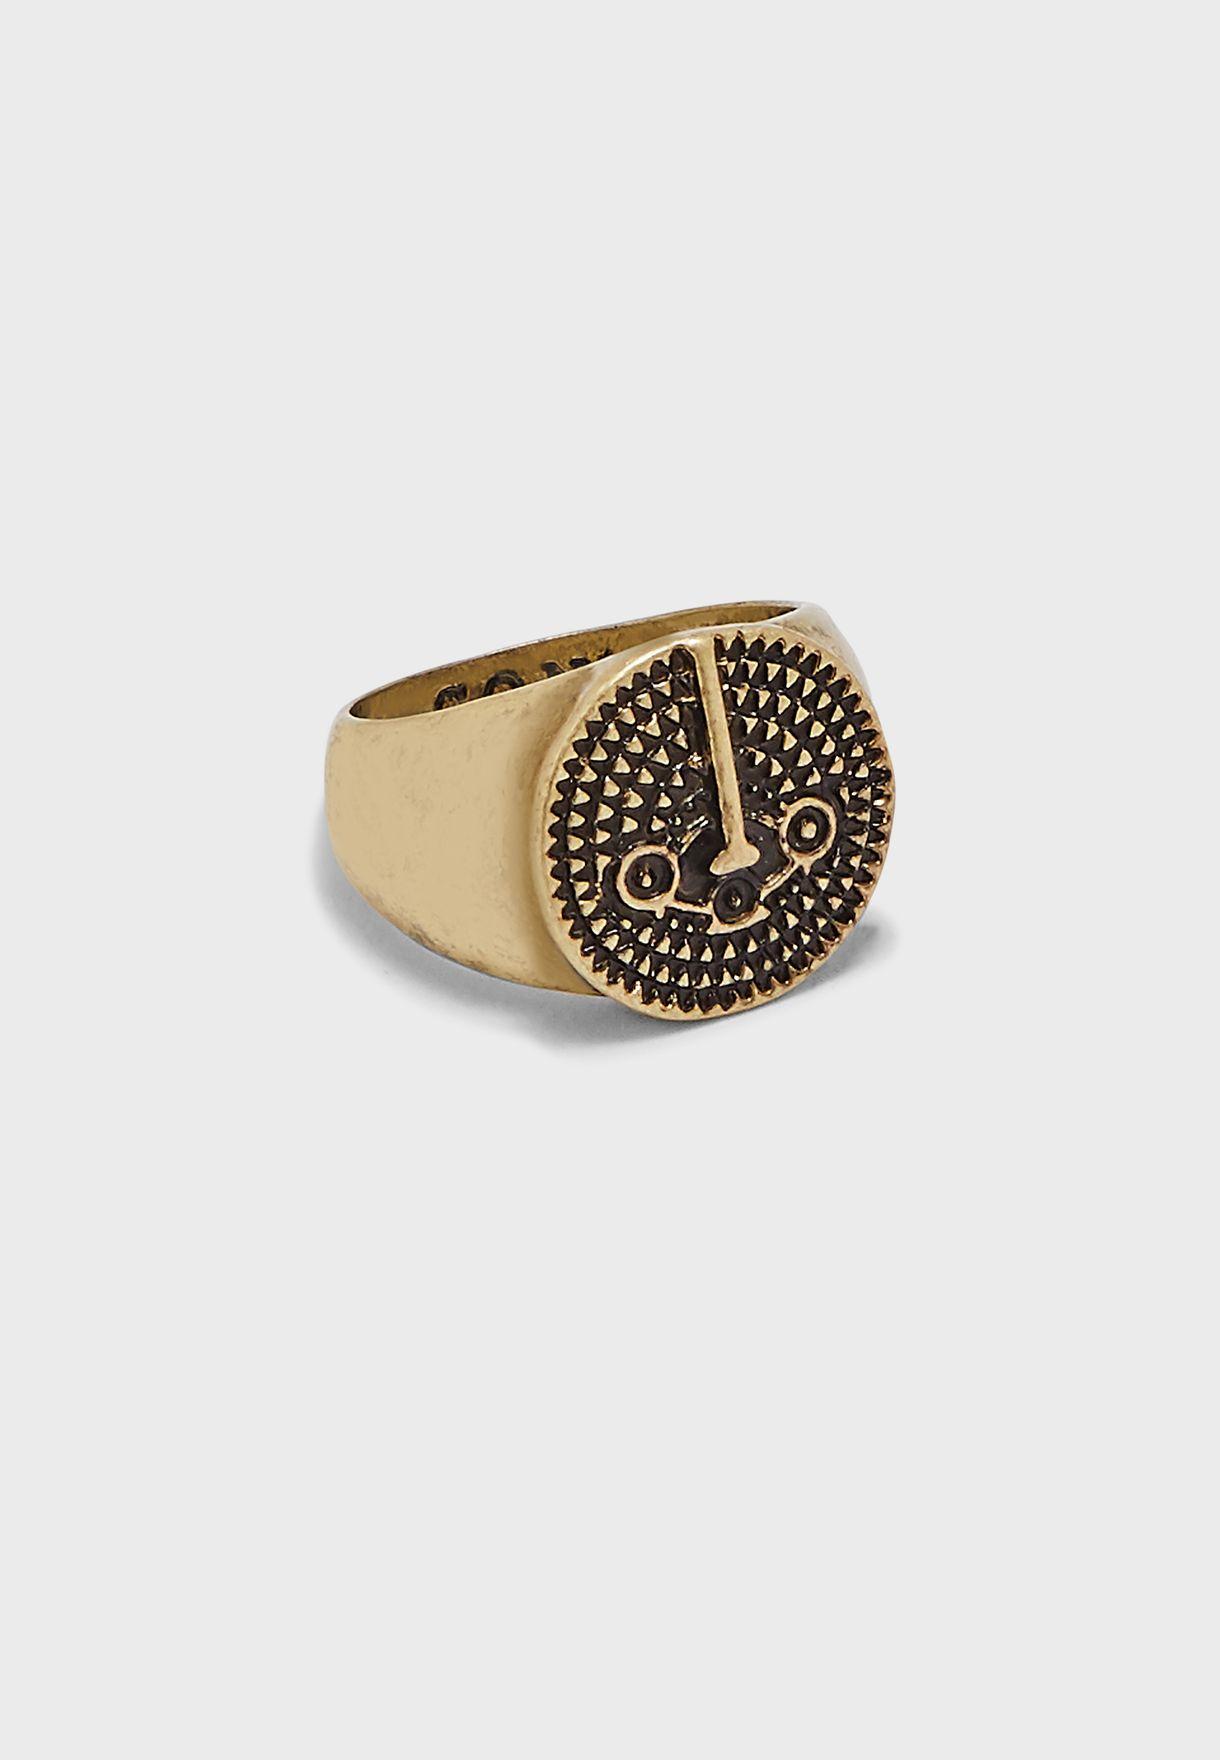 Bobo Signet Ring